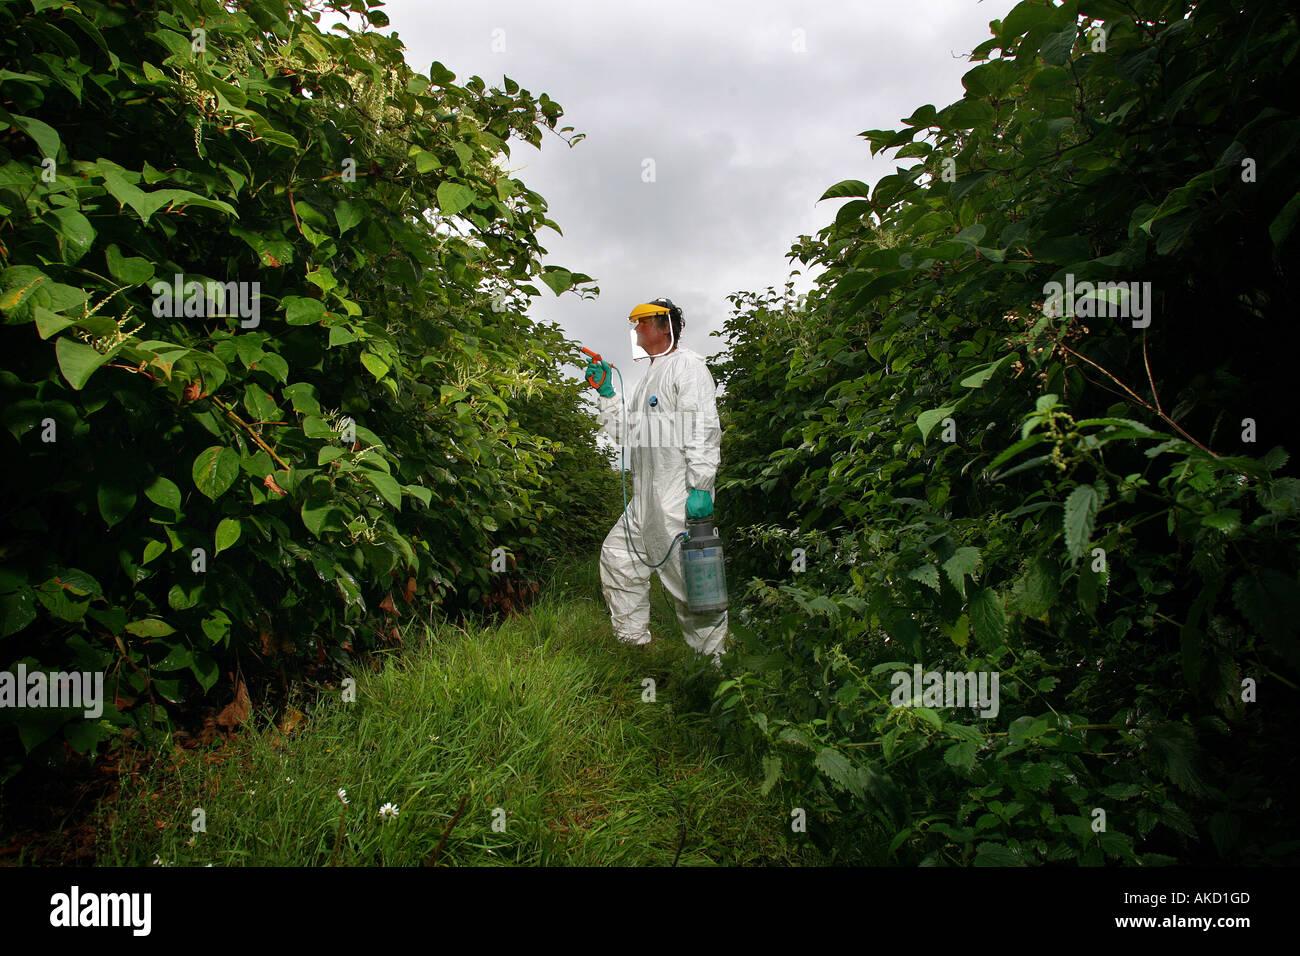 A pest eradication expert poisons Japanese knotweed in Cornwall England UK Stock Photo